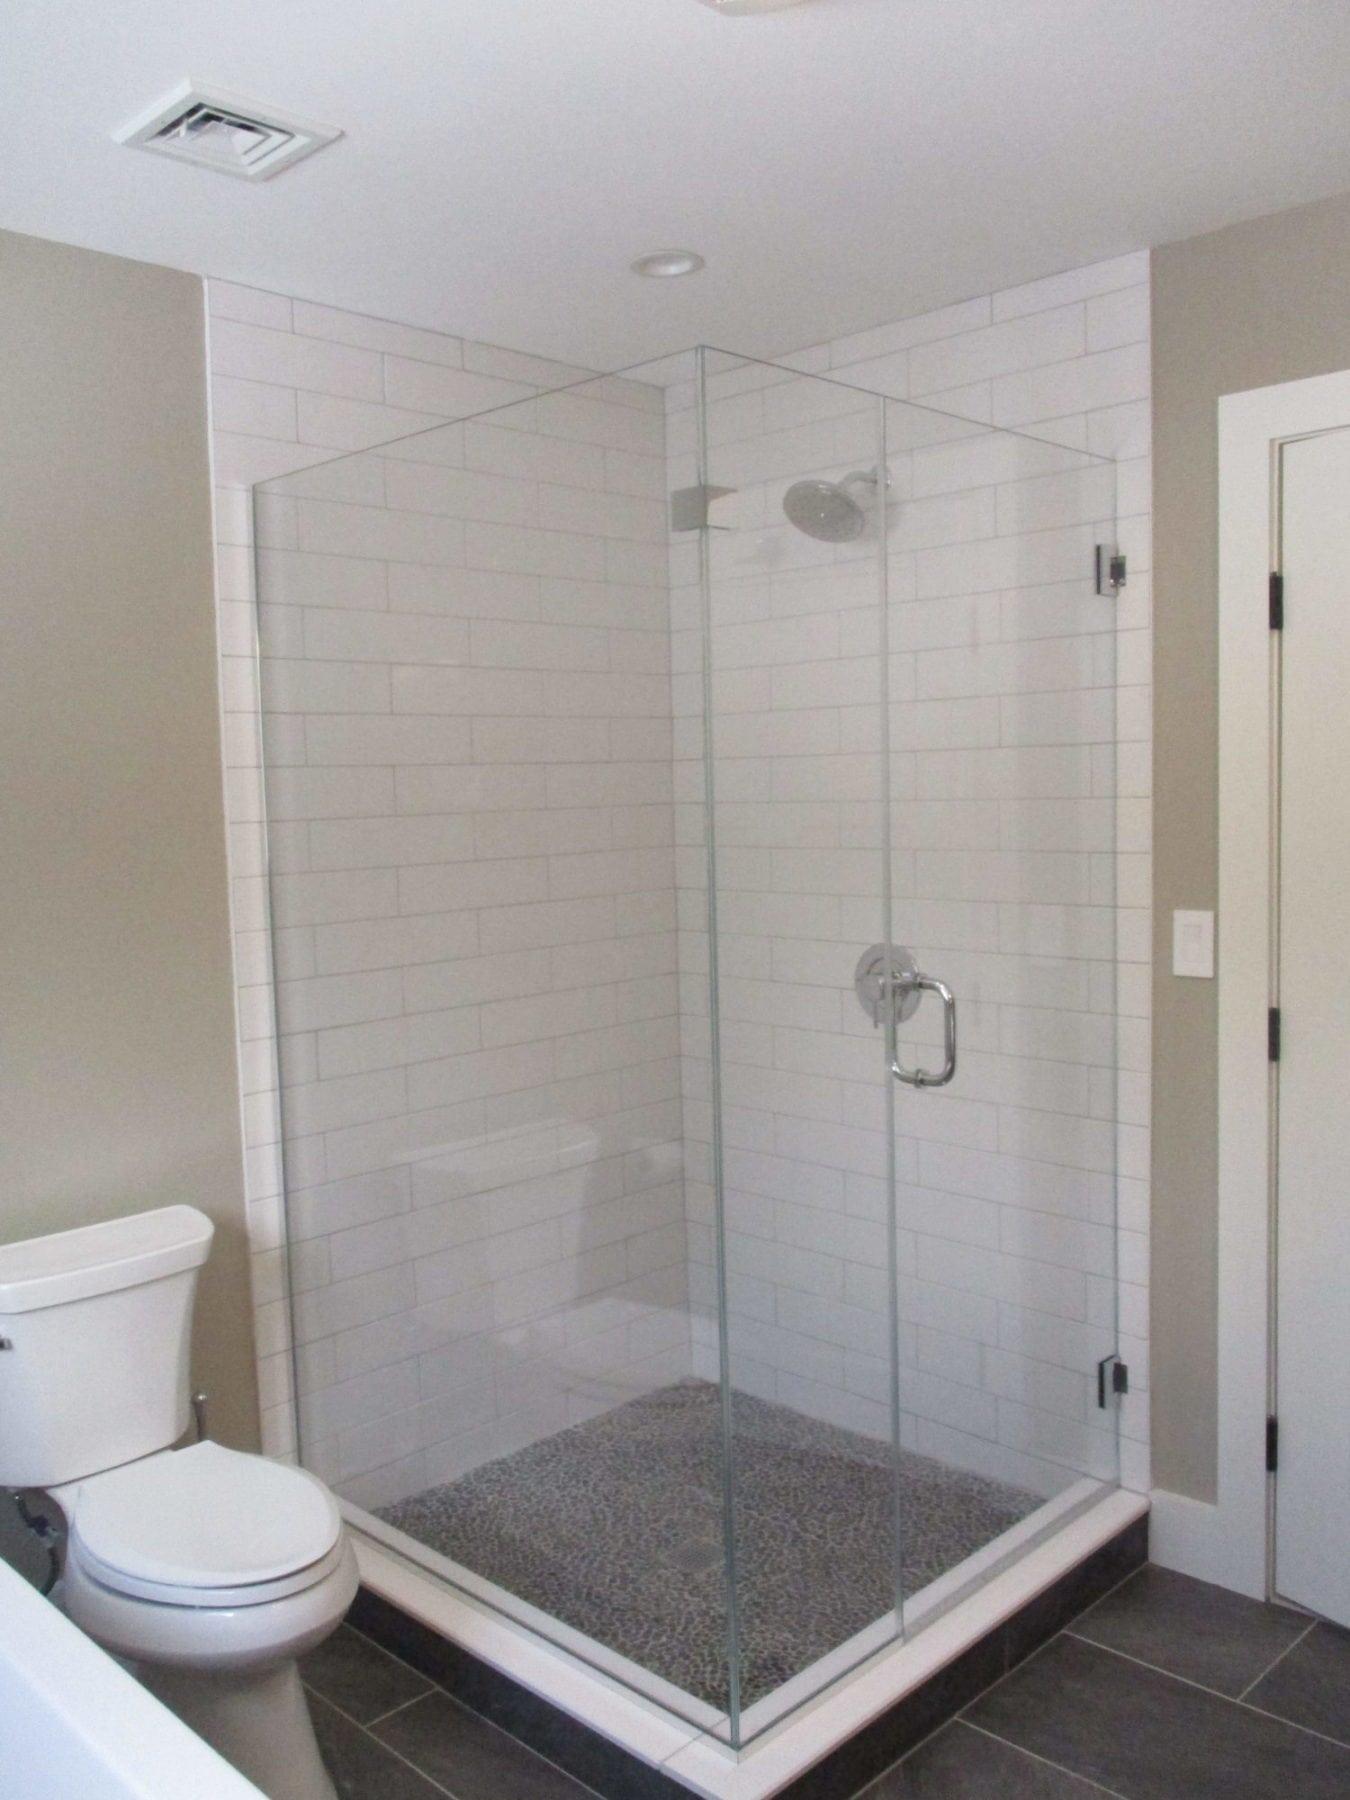 Frameless Corner Shower Enclosure - Absolute Shower Doors